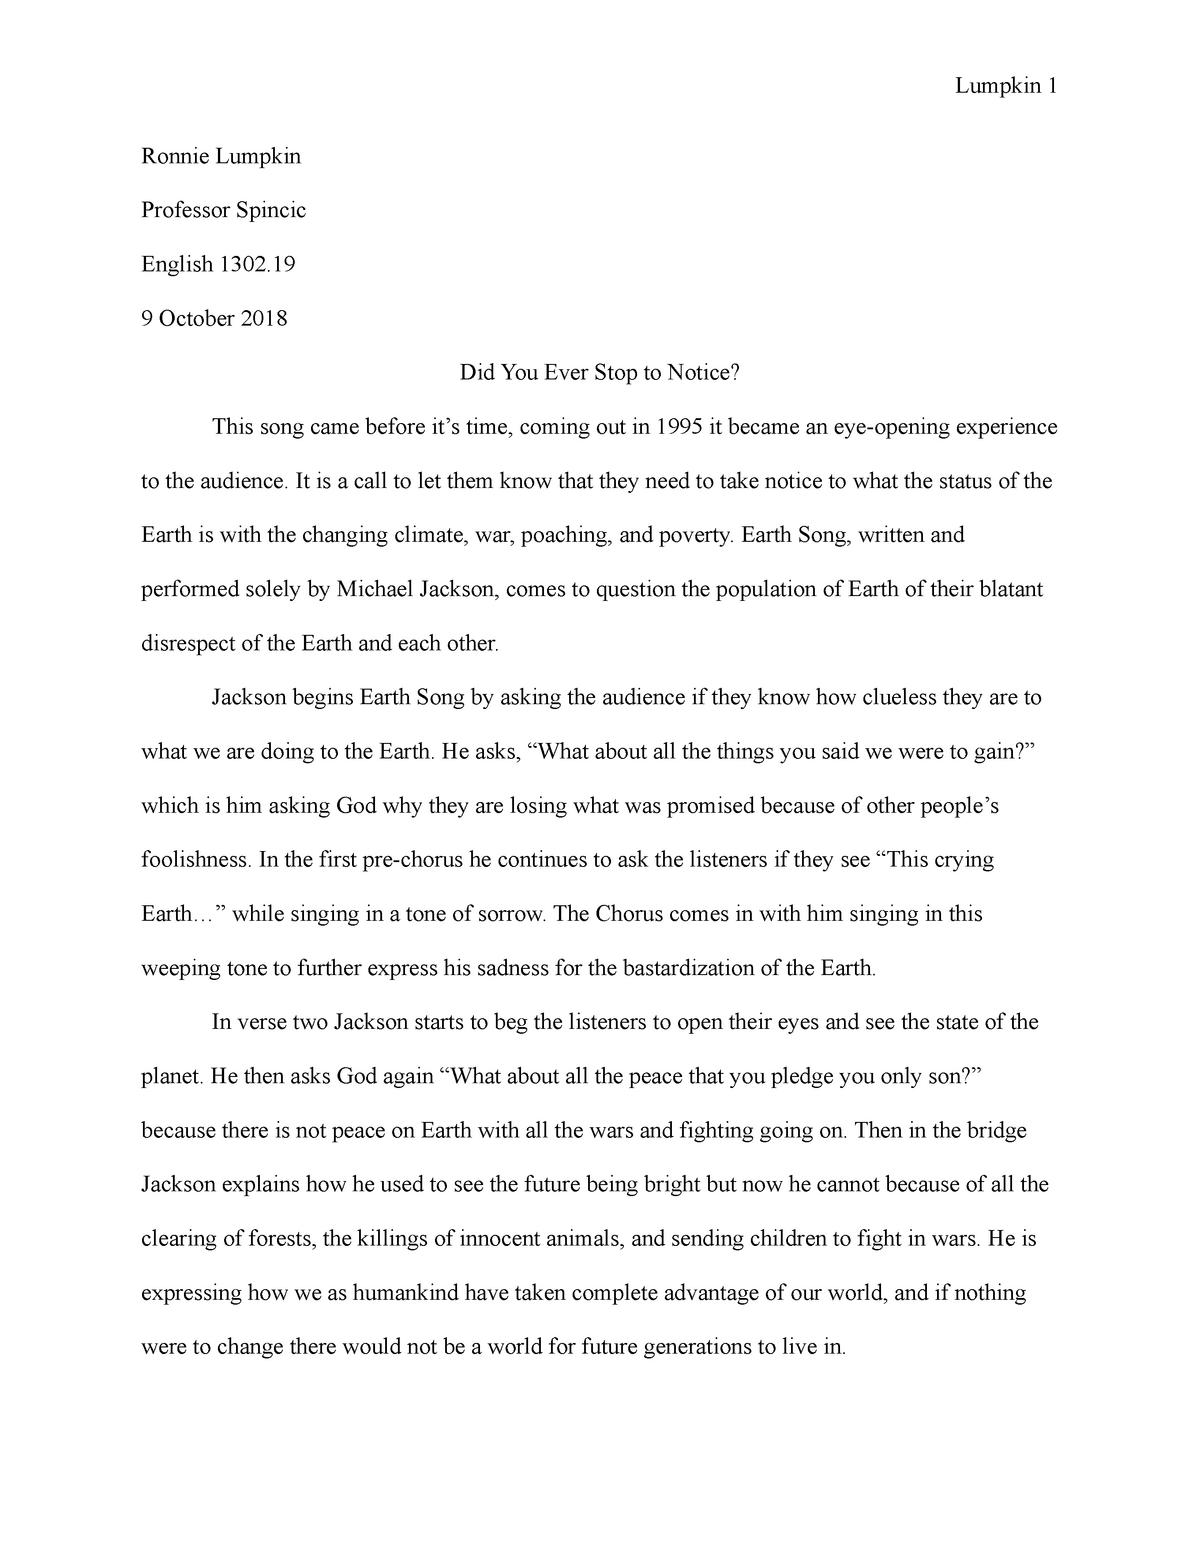 Lyrical Analysis - ENG 165: Composition Ii - StuDocu